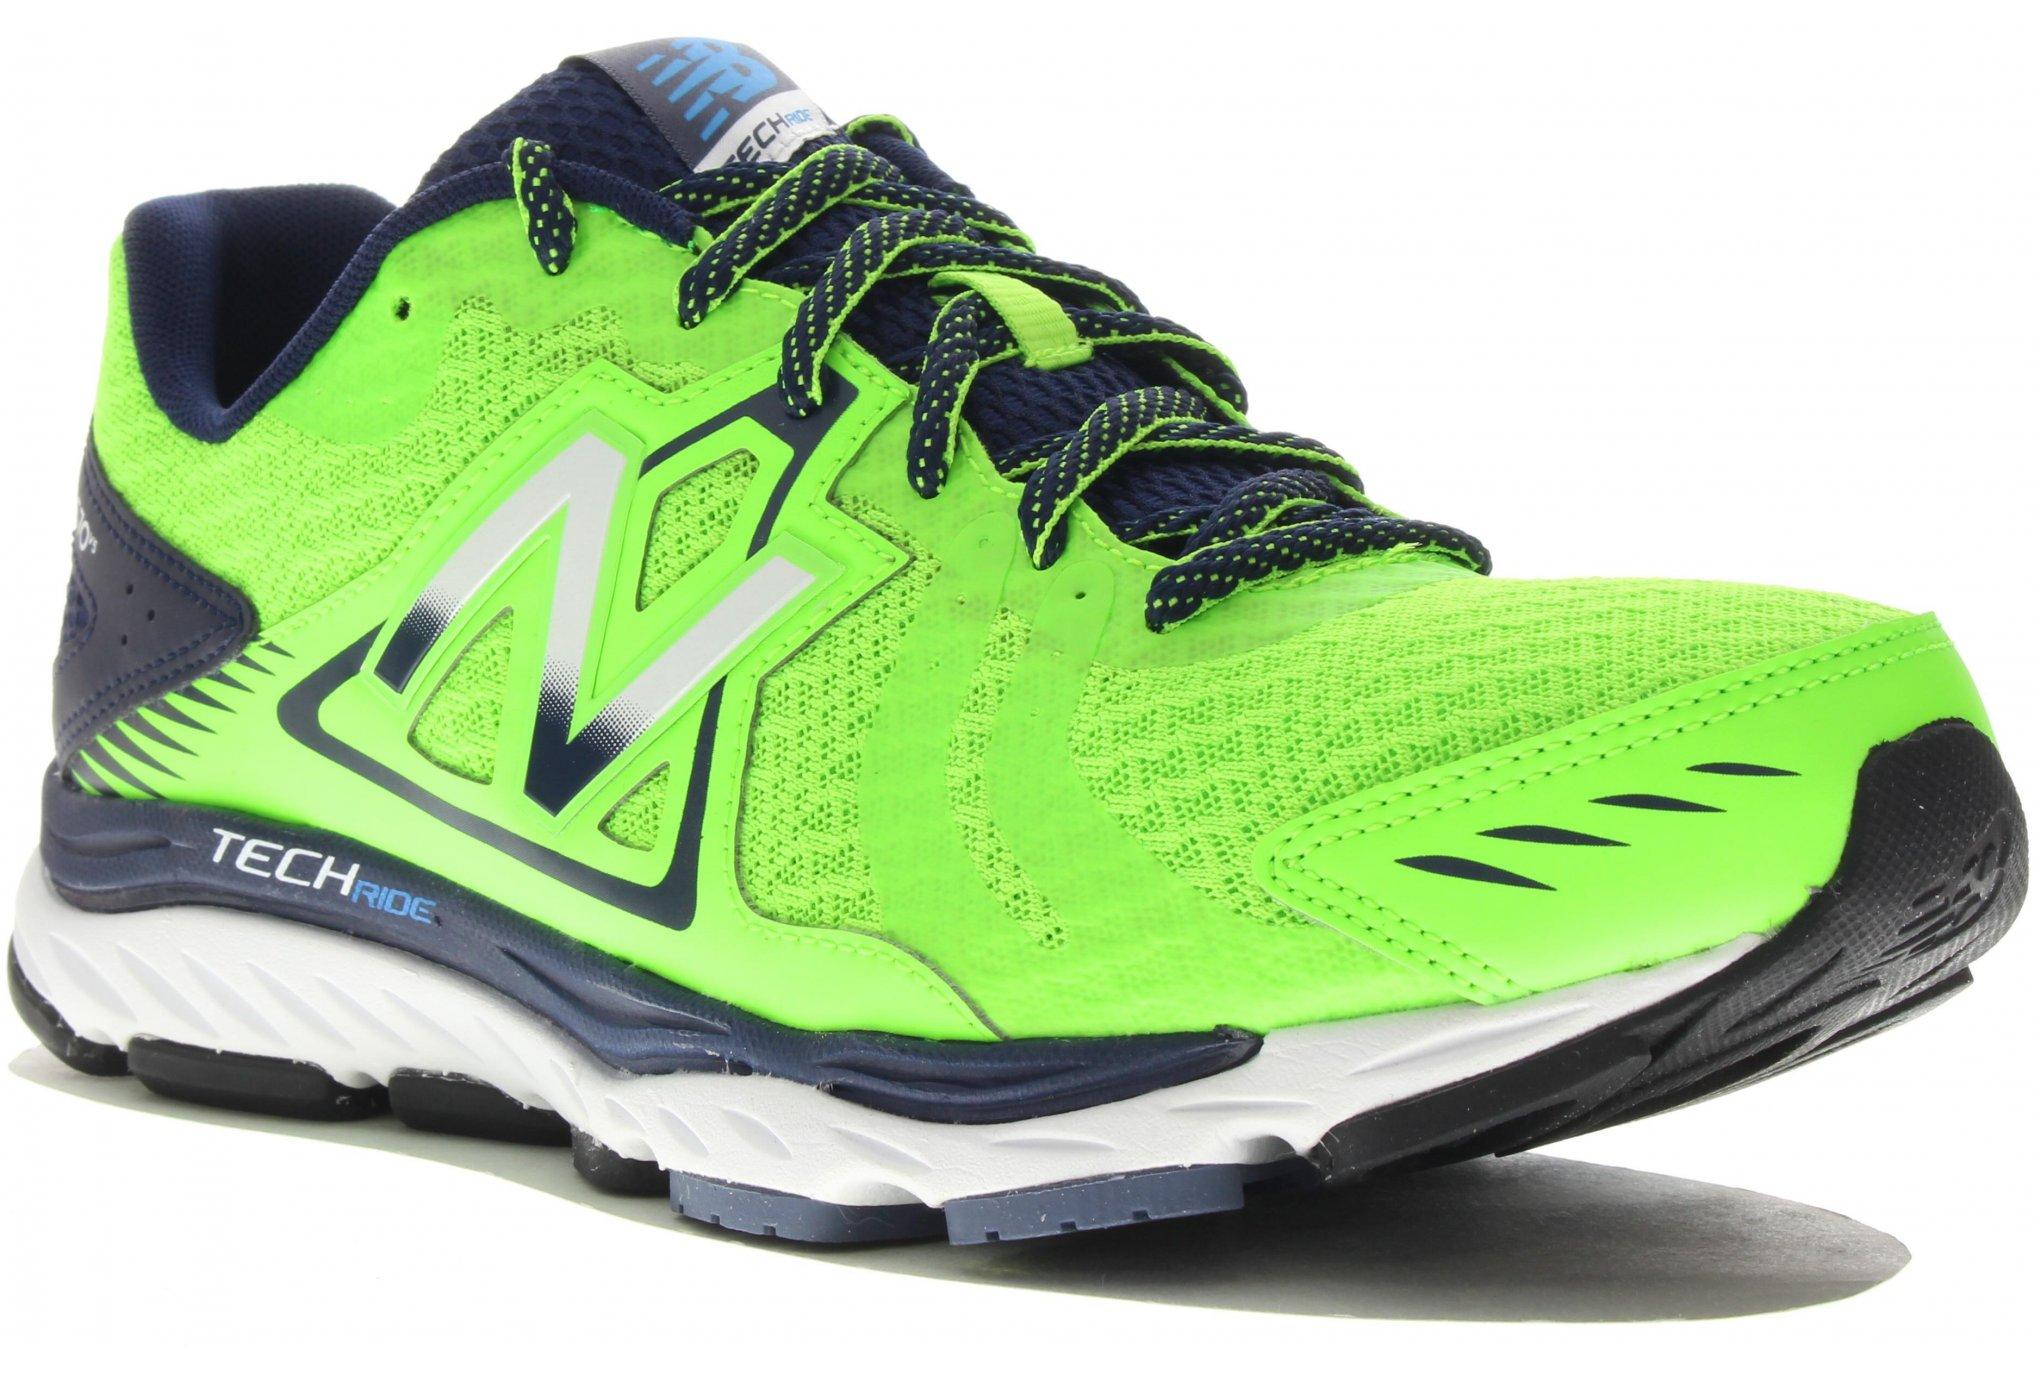 new styles 706d5 0b88d Resathlon - New Balance M 670 v5 Chaussures homme